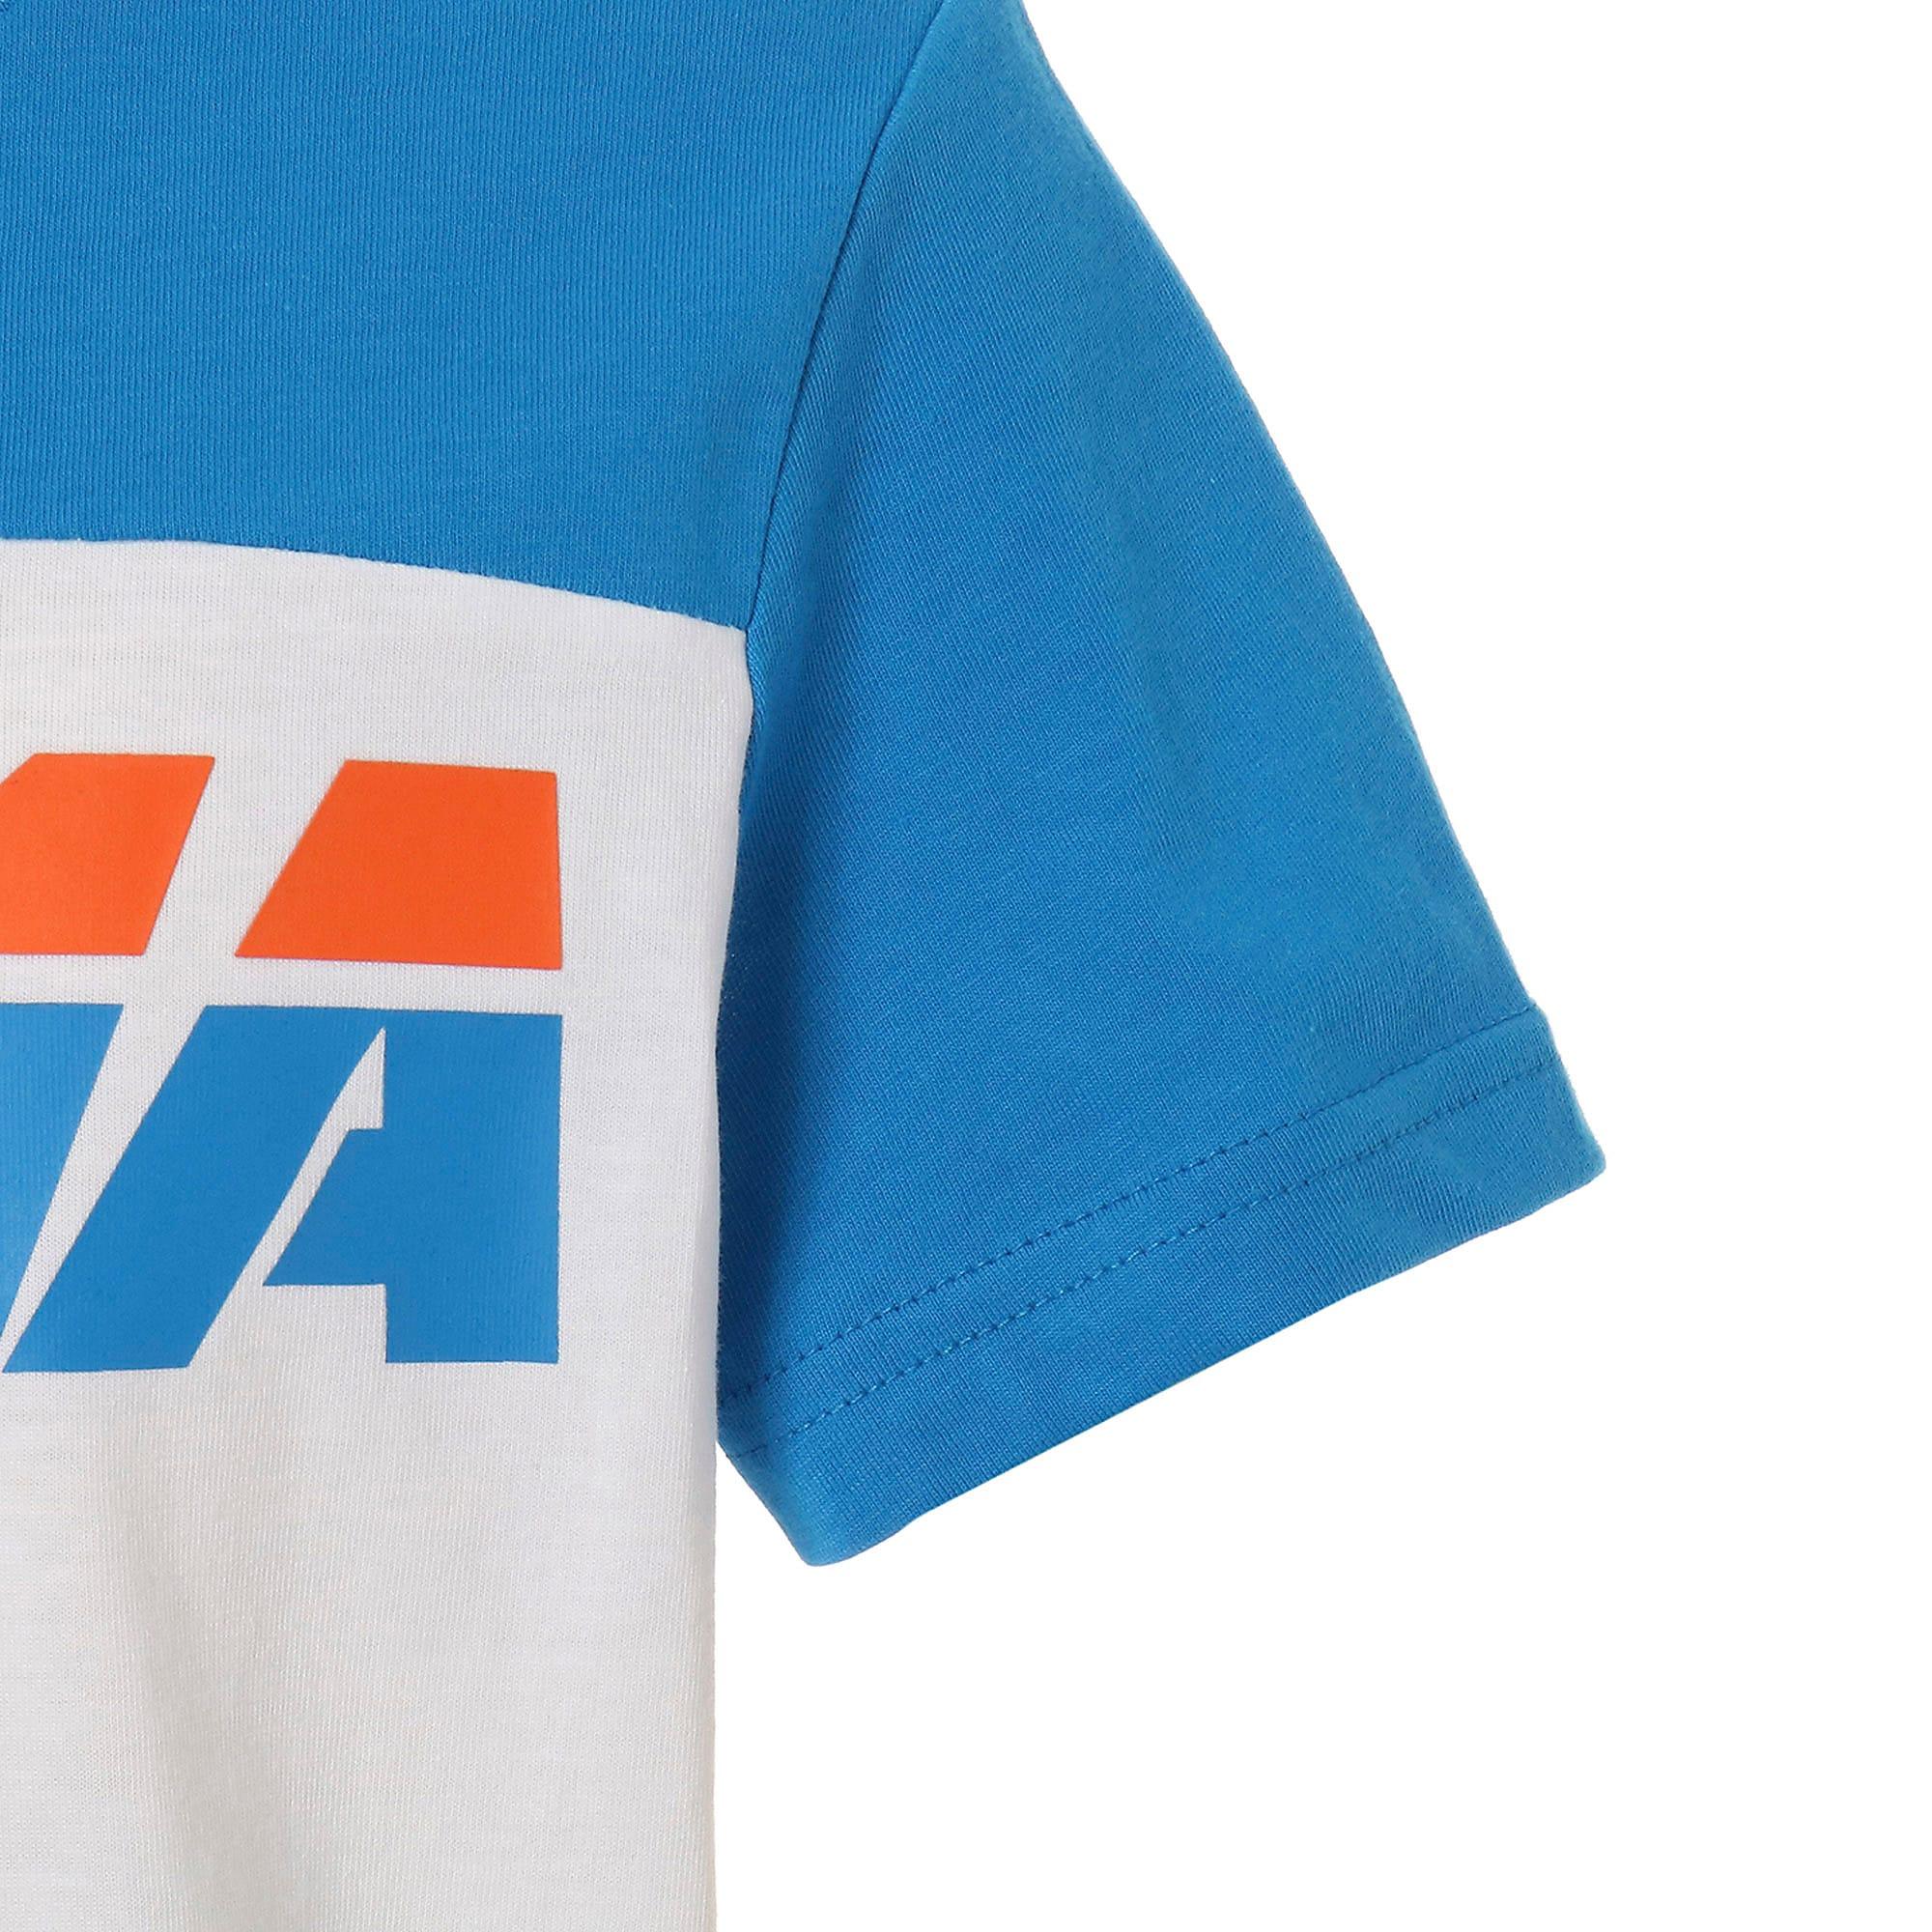 Thumbnail 5 of キッズ ALPHA SS トレンド Tシャツ 半袖, Puma White, medium-JPN